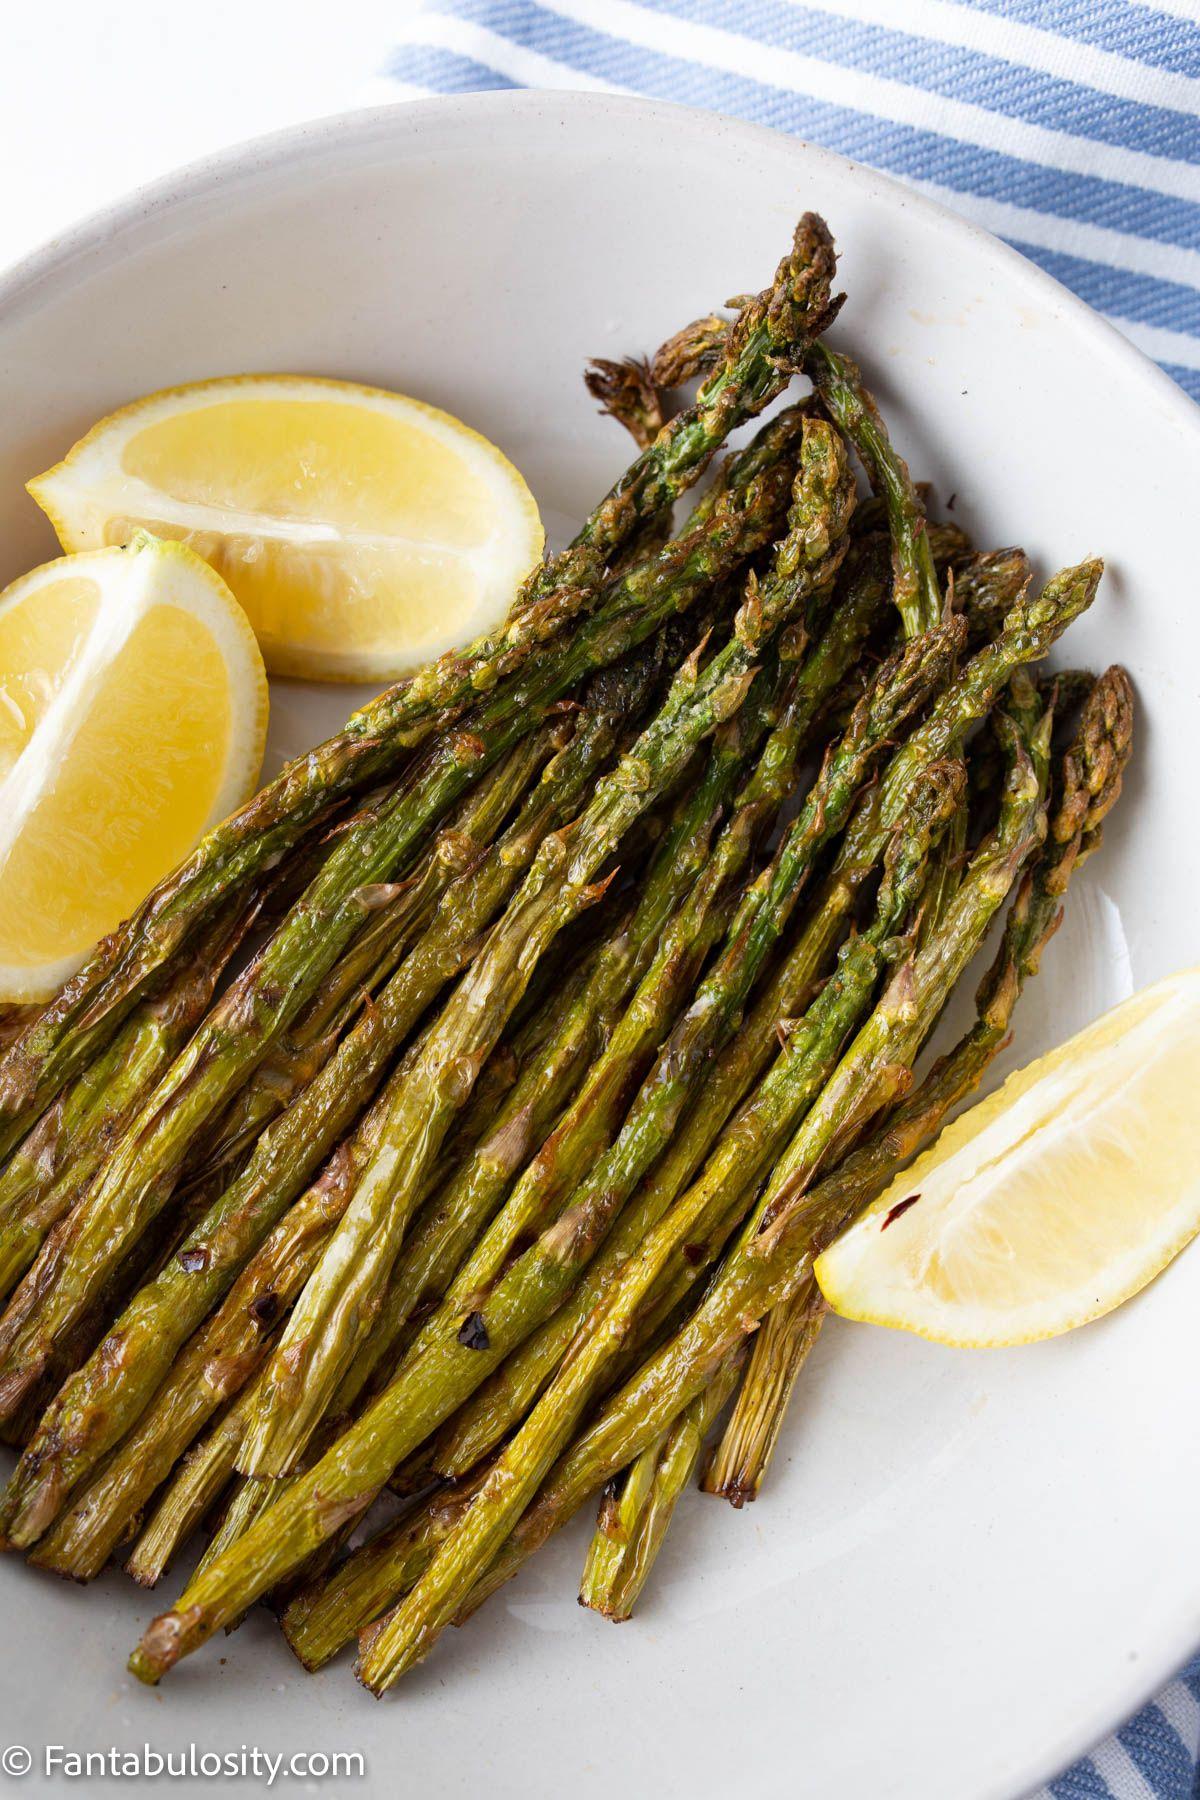 Crispy Air fryer asparagus on a white plate with lemon wedges